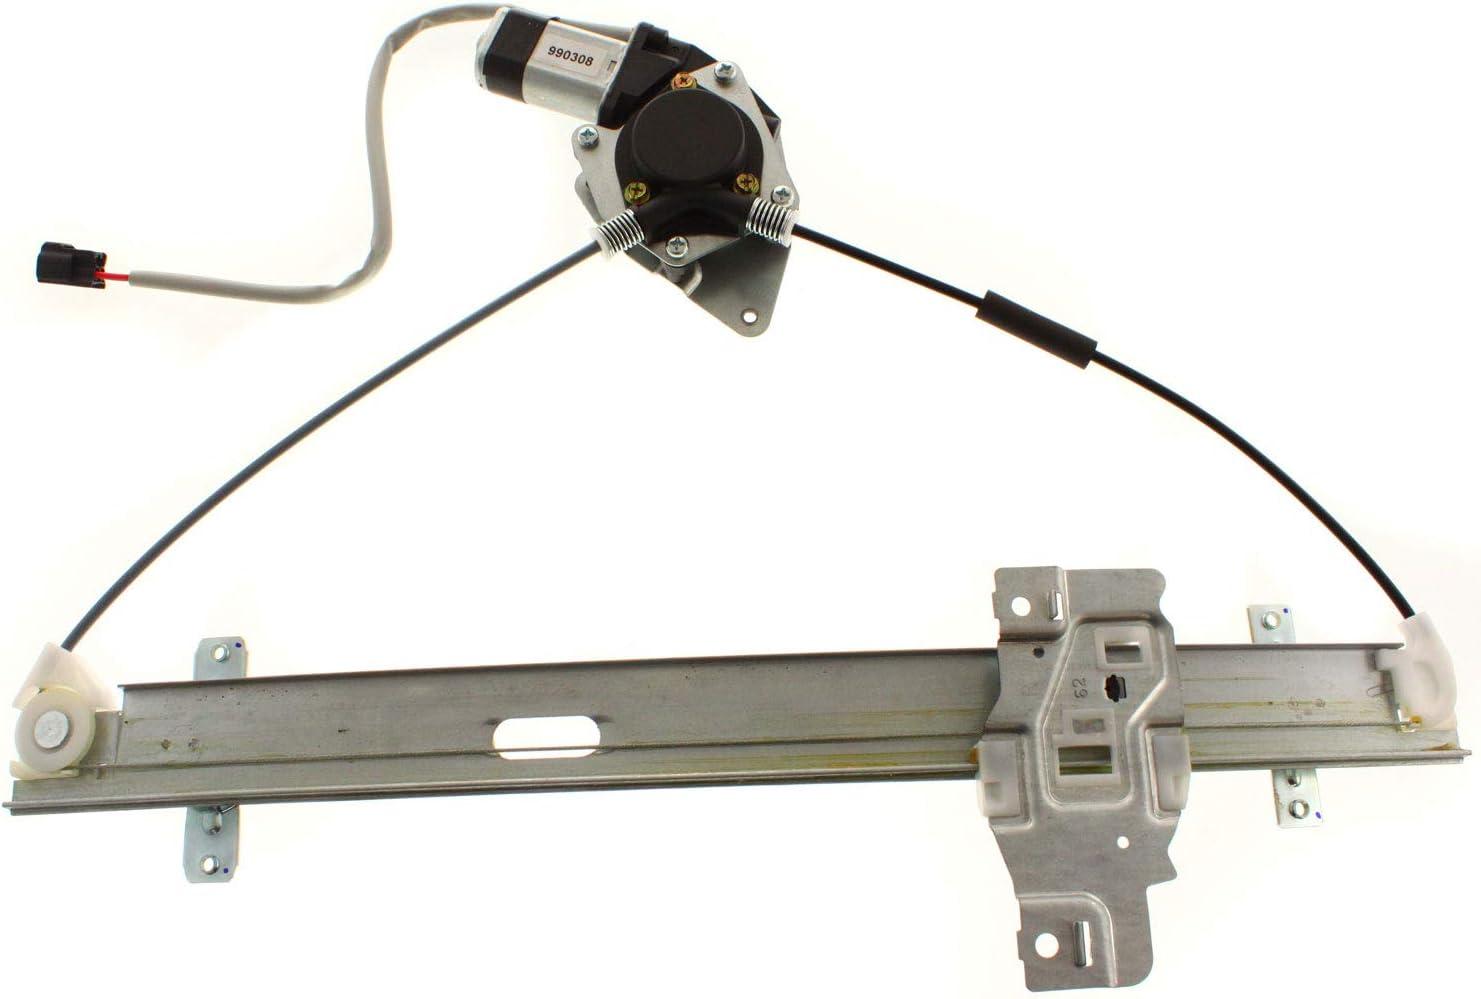 Passenger Side With Motor Power Window Regulator For 98-2004 Isuzu Rodeo Rear